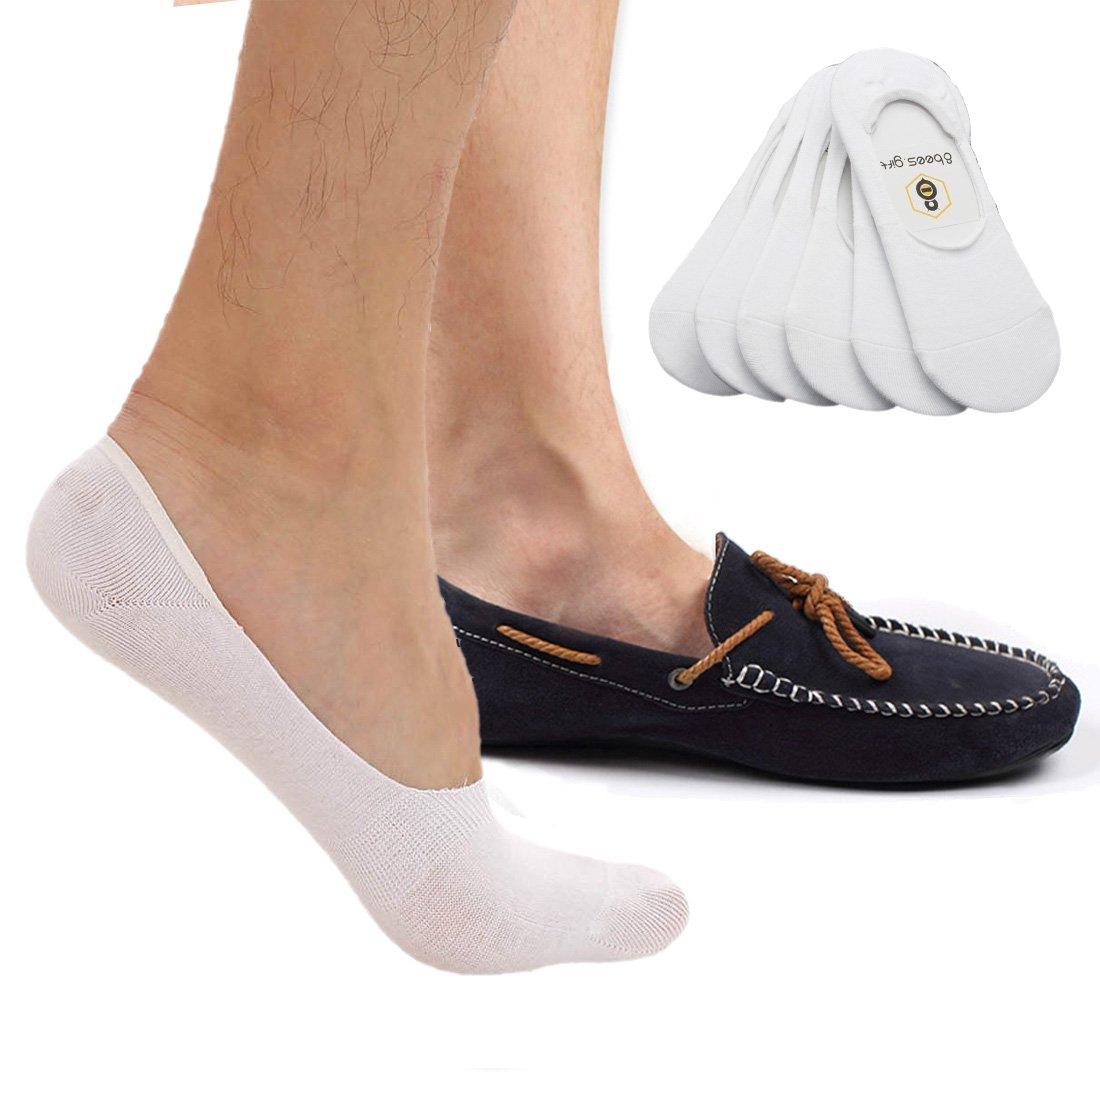 No Show Socks 8BEES GIFT Mens Socks Low Cut Non-Slip Grips 6 Pairs G1606701-mensocks